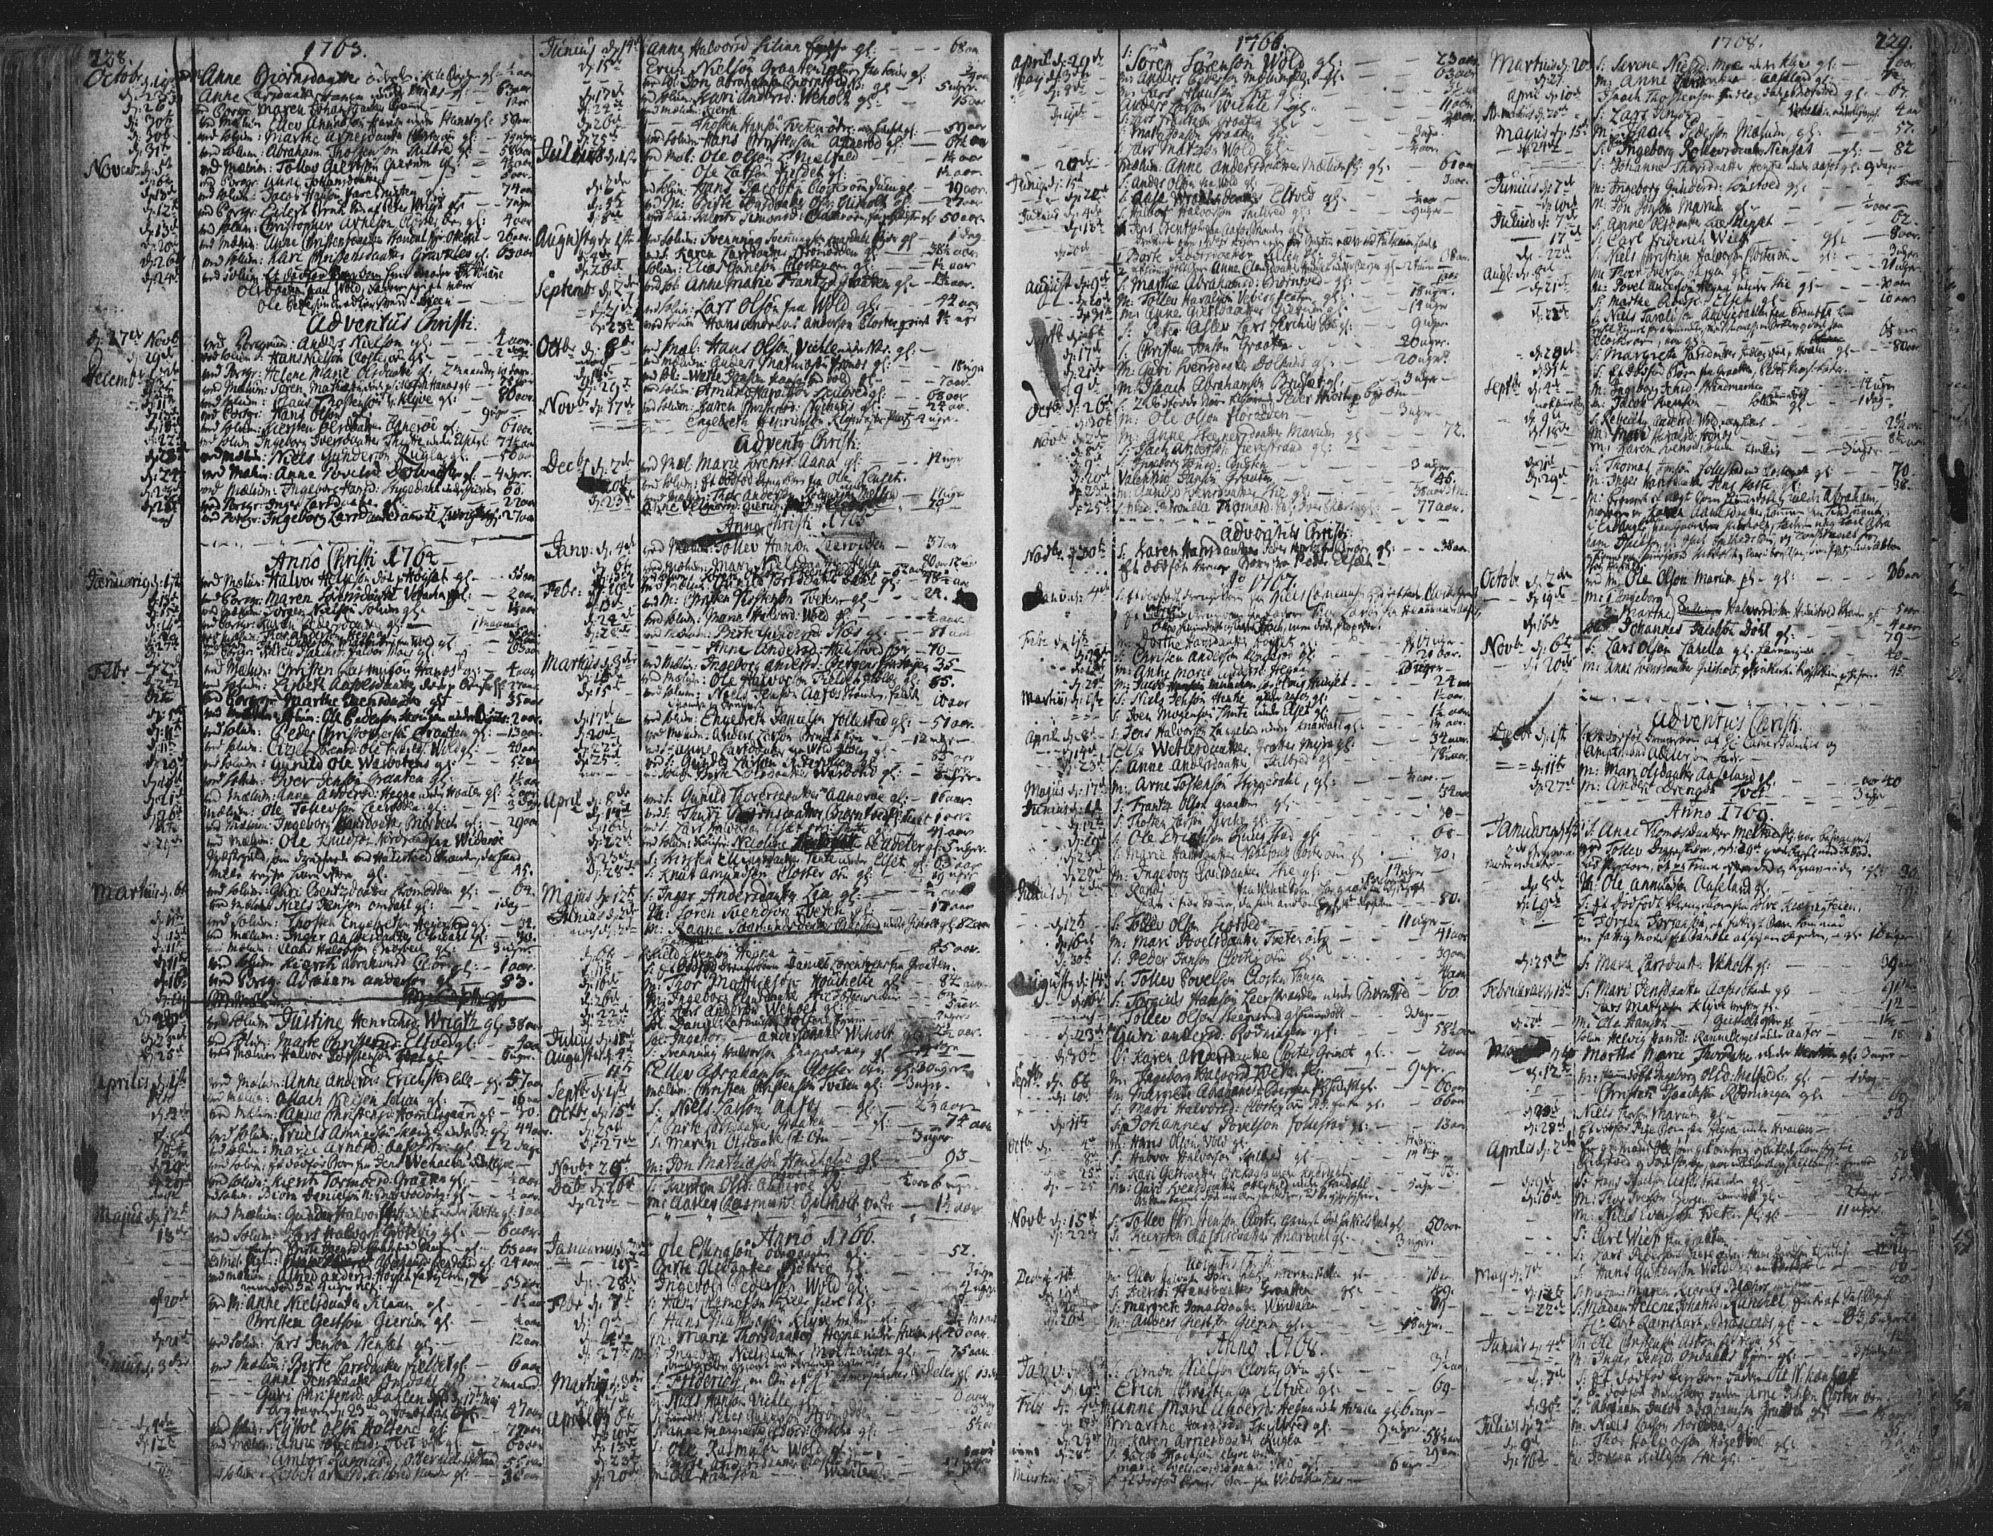 SAKO, Solum kirkebøker, F/Fa/L0003: Ministerialbok nr. I 3, 1761-1814, s. 228-229